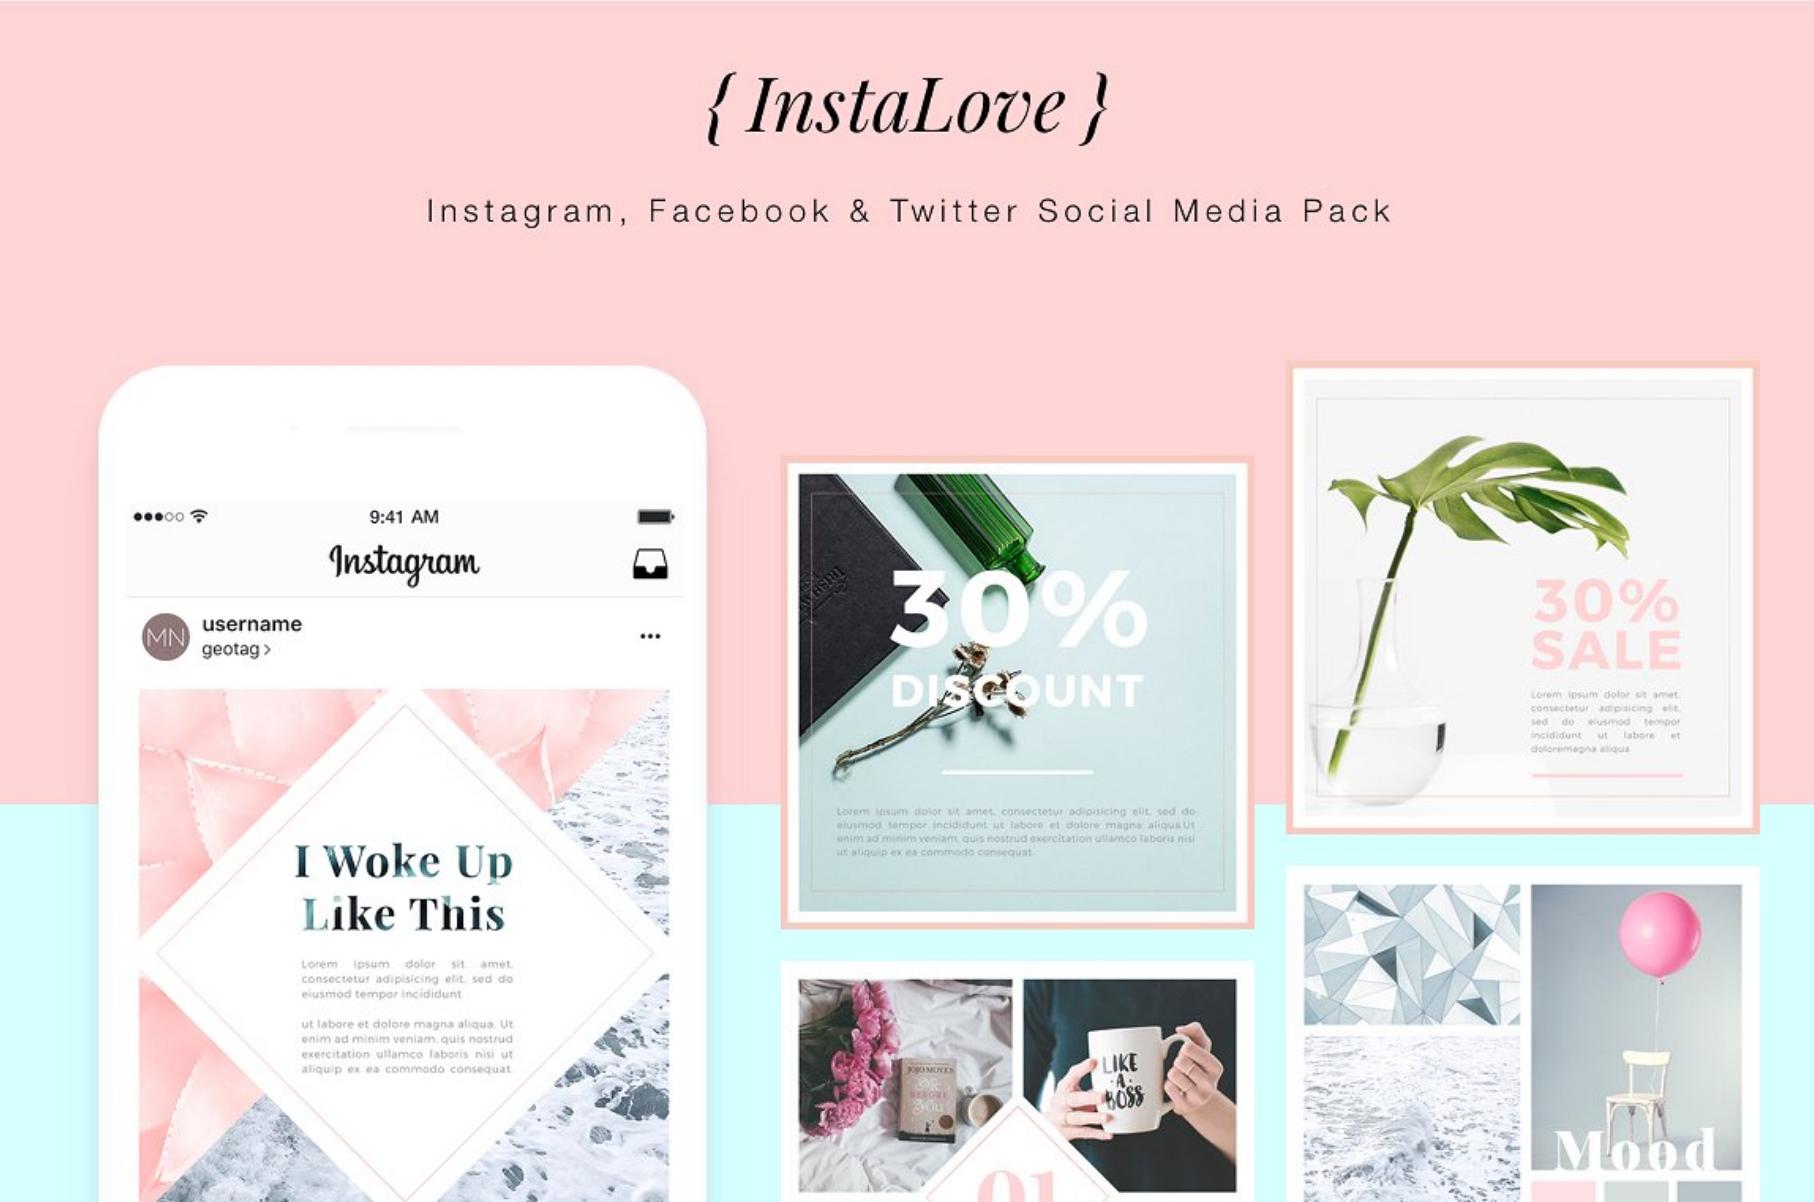 For Bloggers Instagram Social Media Facebook Graphics Mock Up Minimalism Graphic Design Inspiration Layout Marketing Creative Marketvasaresocial